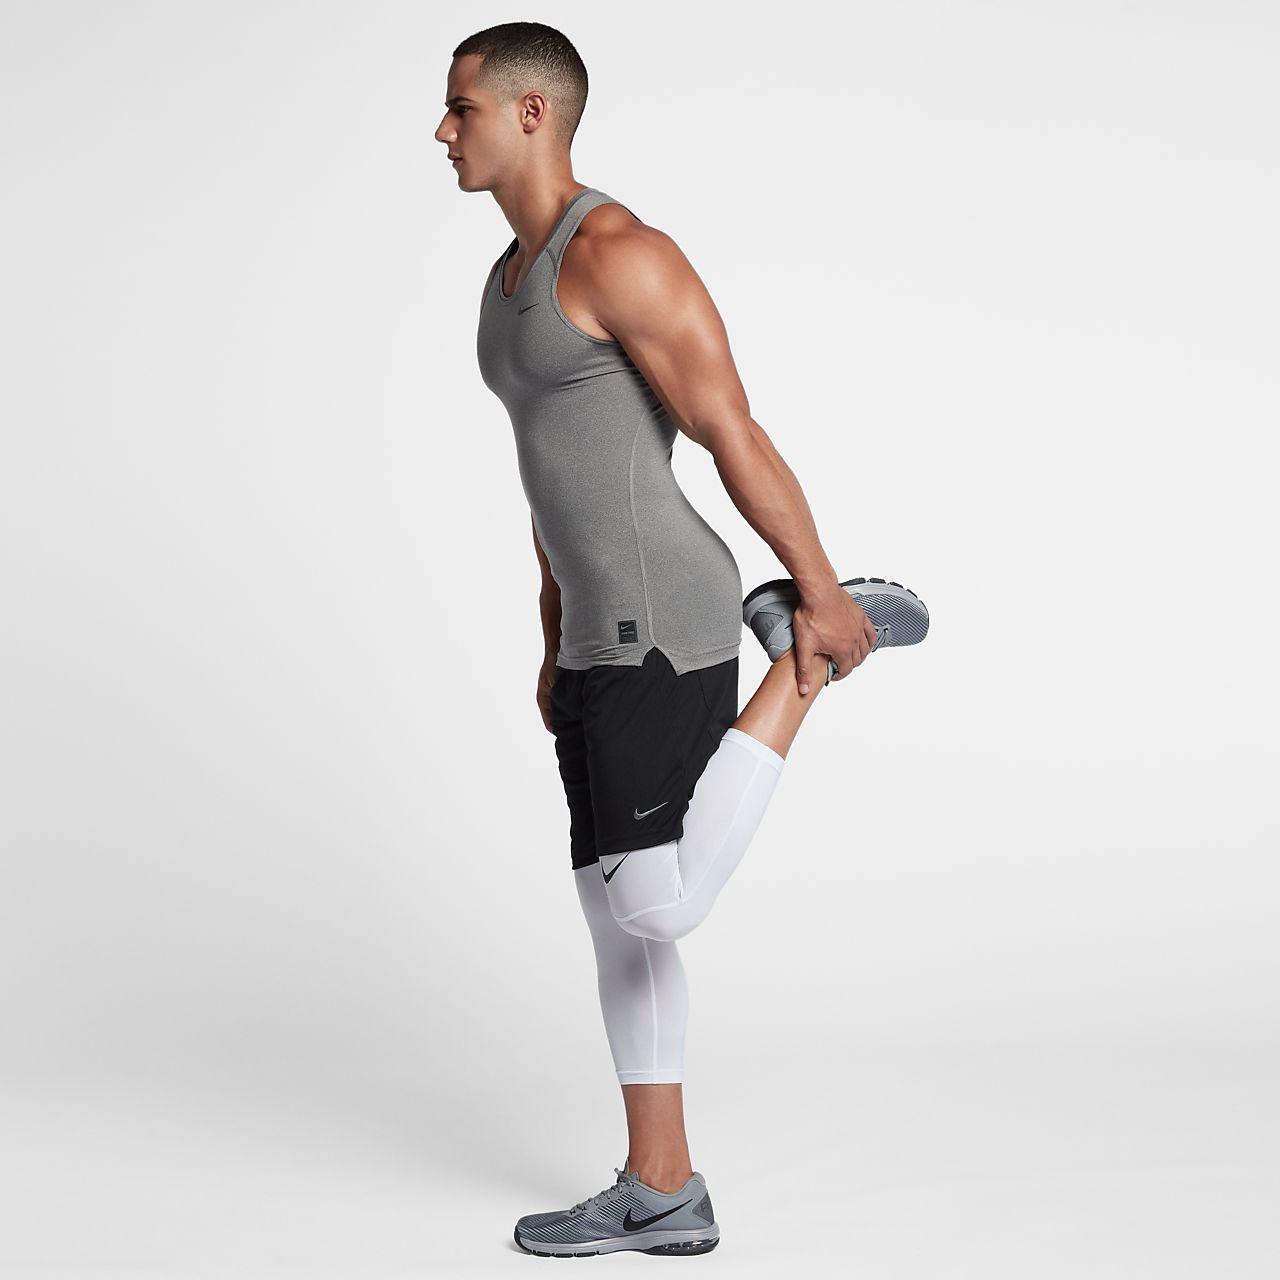 927c3999522cd Nike Pro Men's 3/4 Training Tights. Nike.com